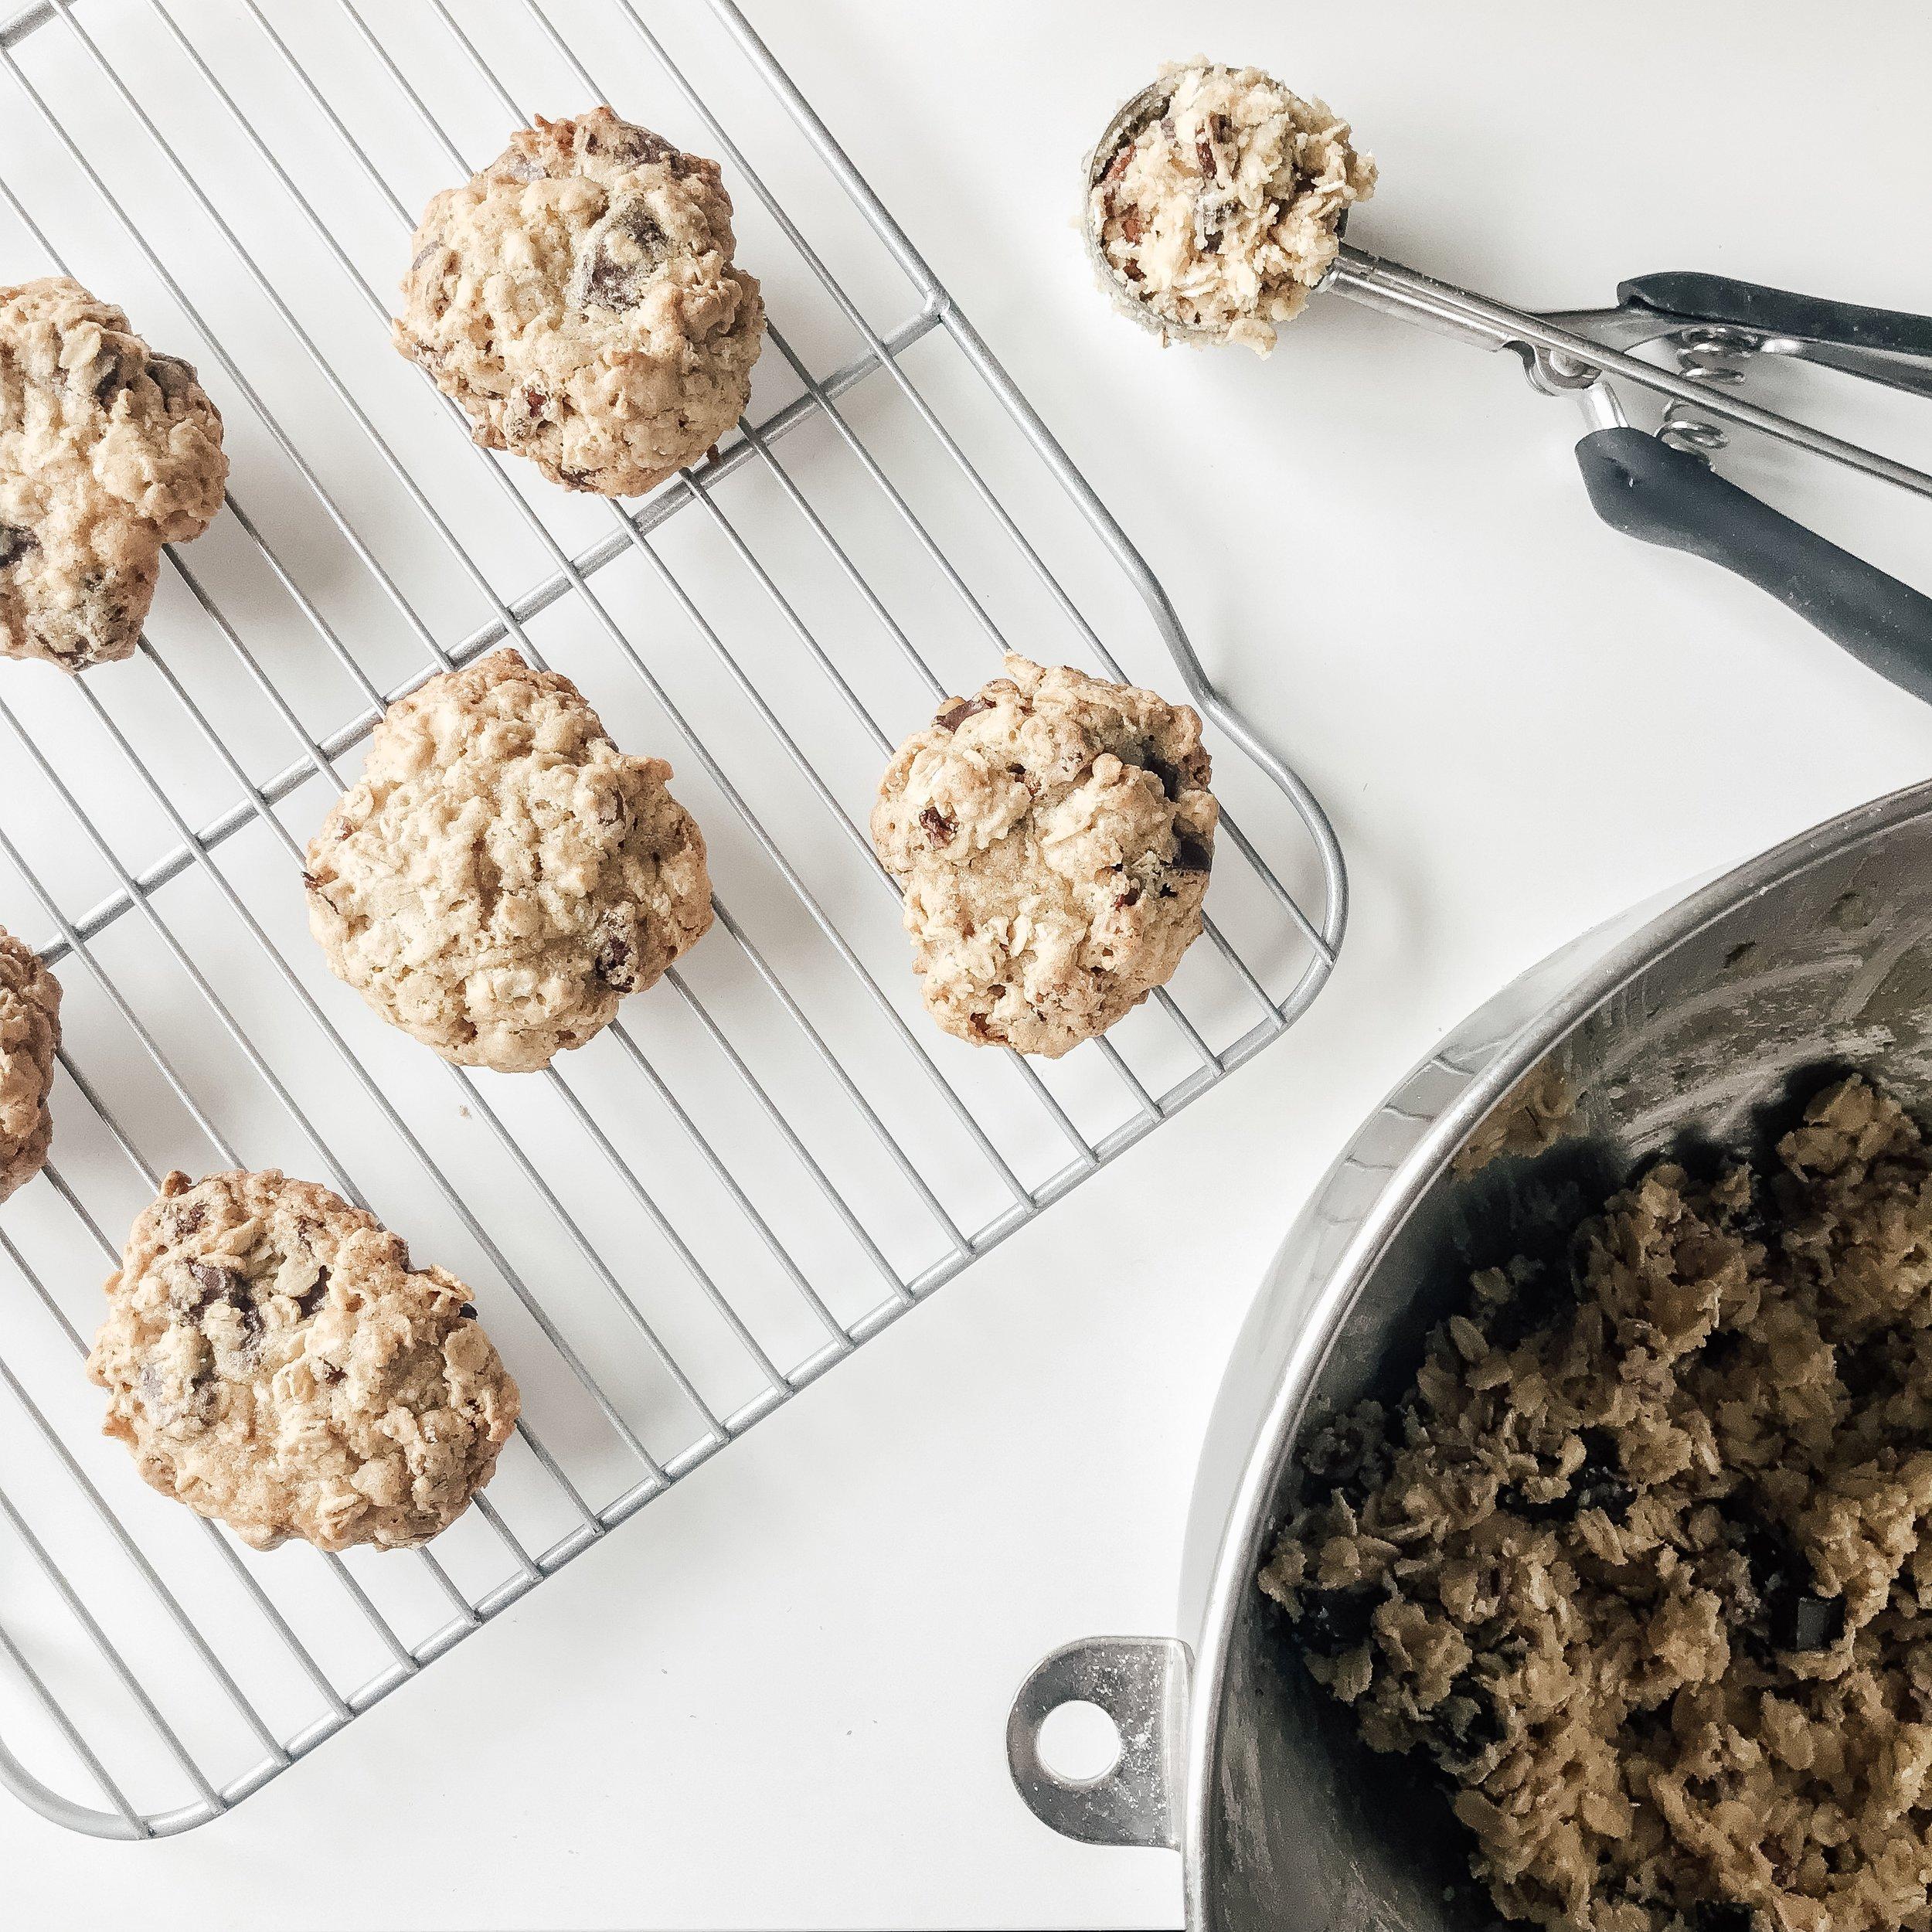 Chocolate-Pecan Oatmeal Cookies - The Life She Wanders